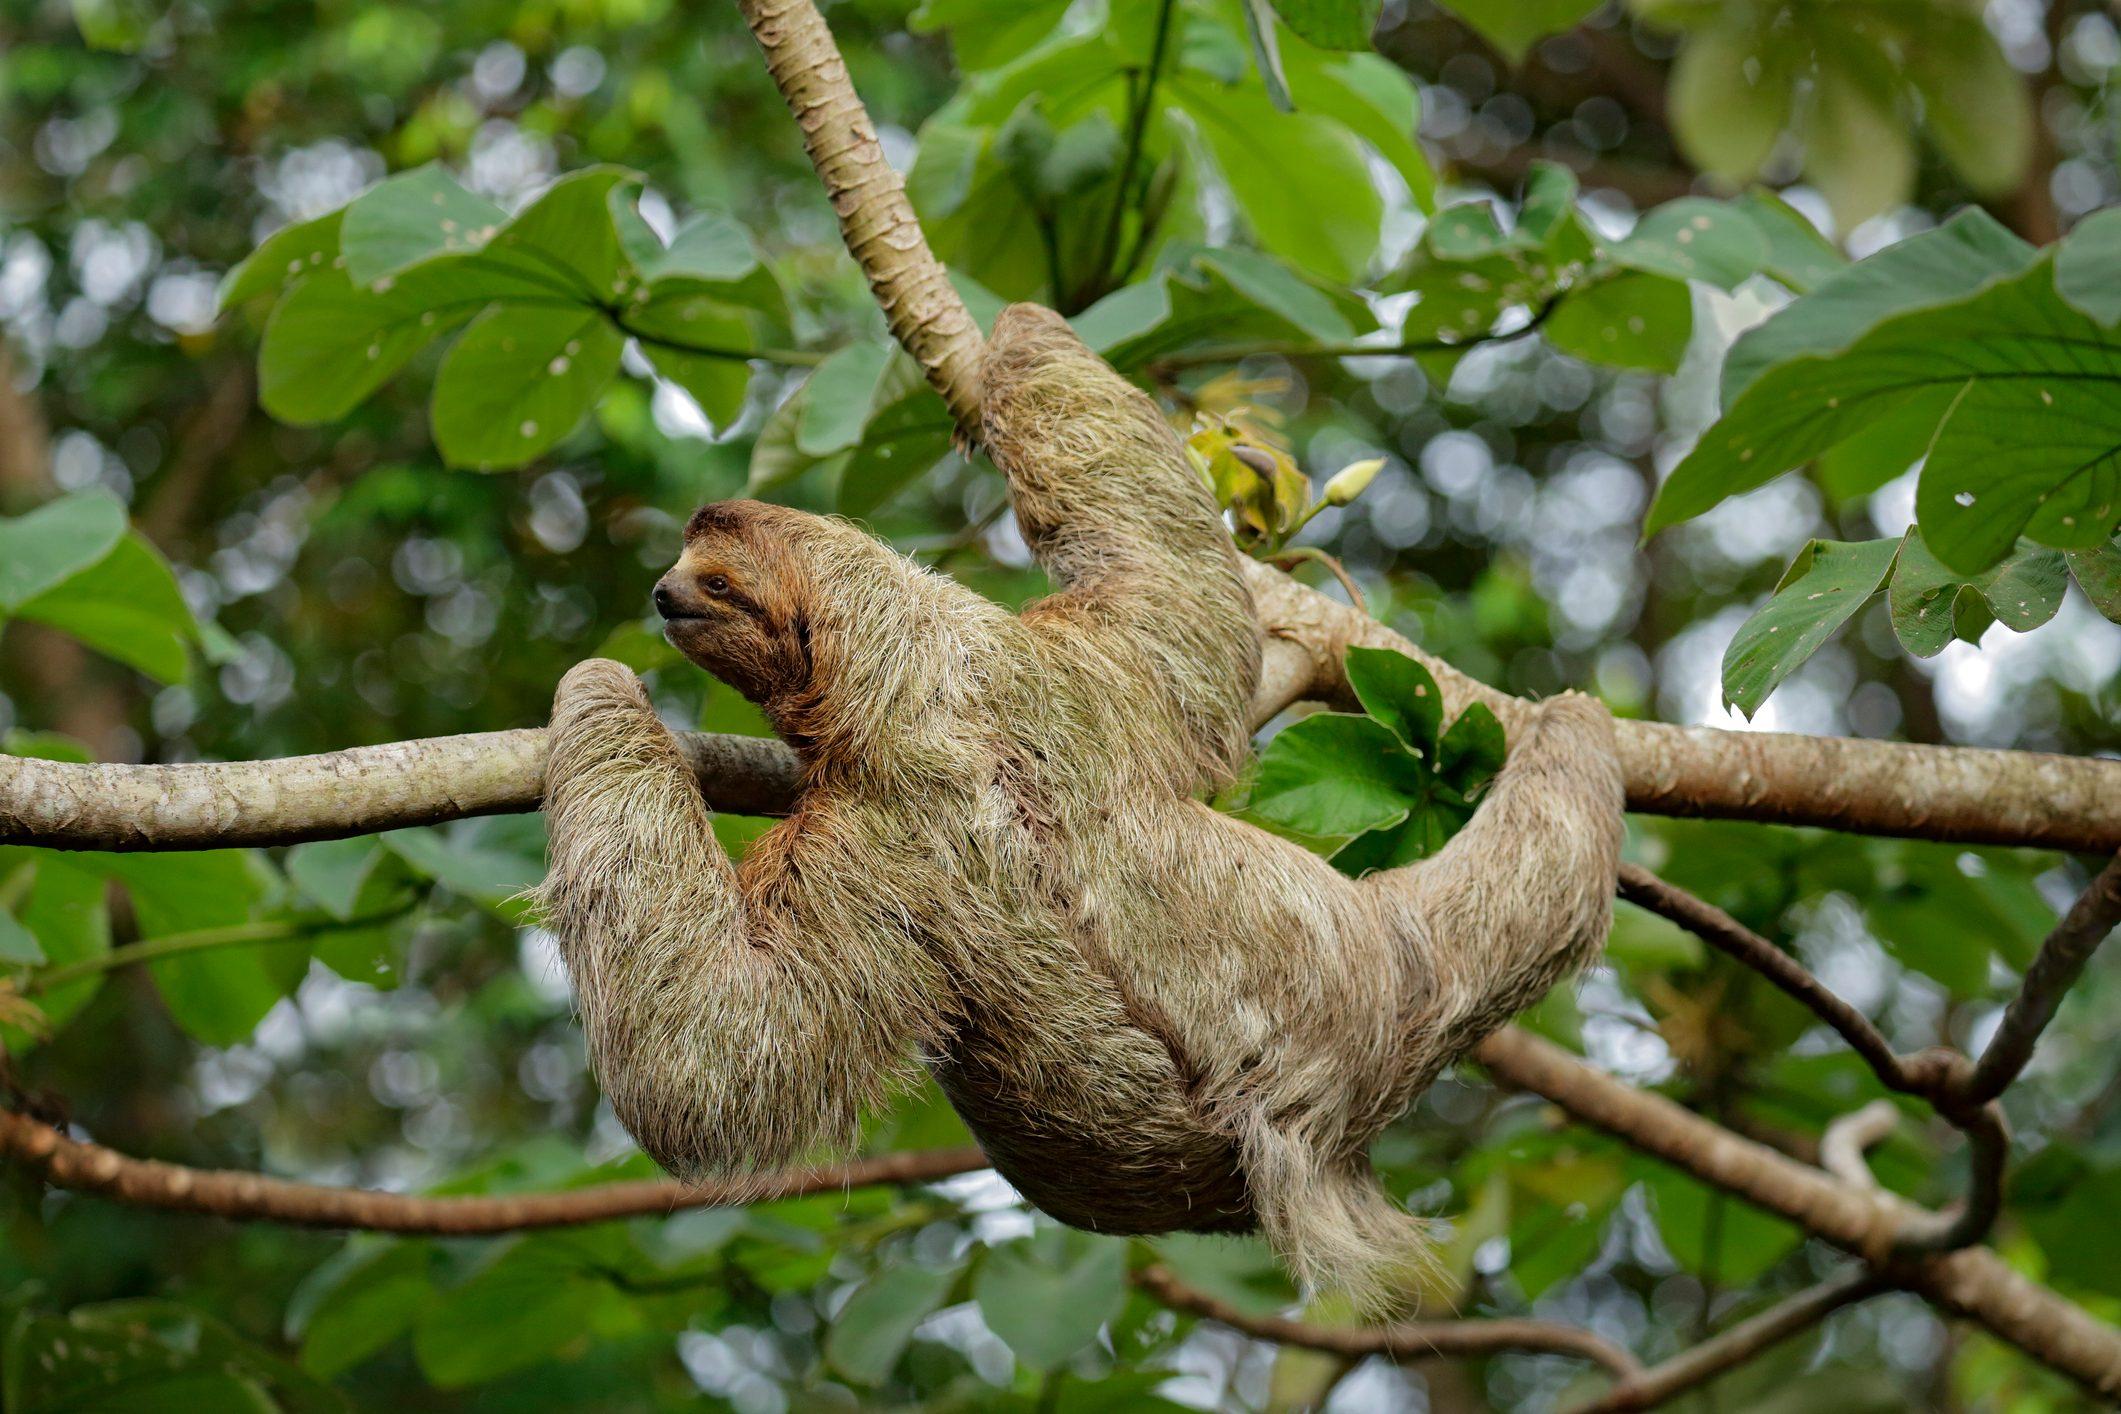 Female Three-toed Sloth